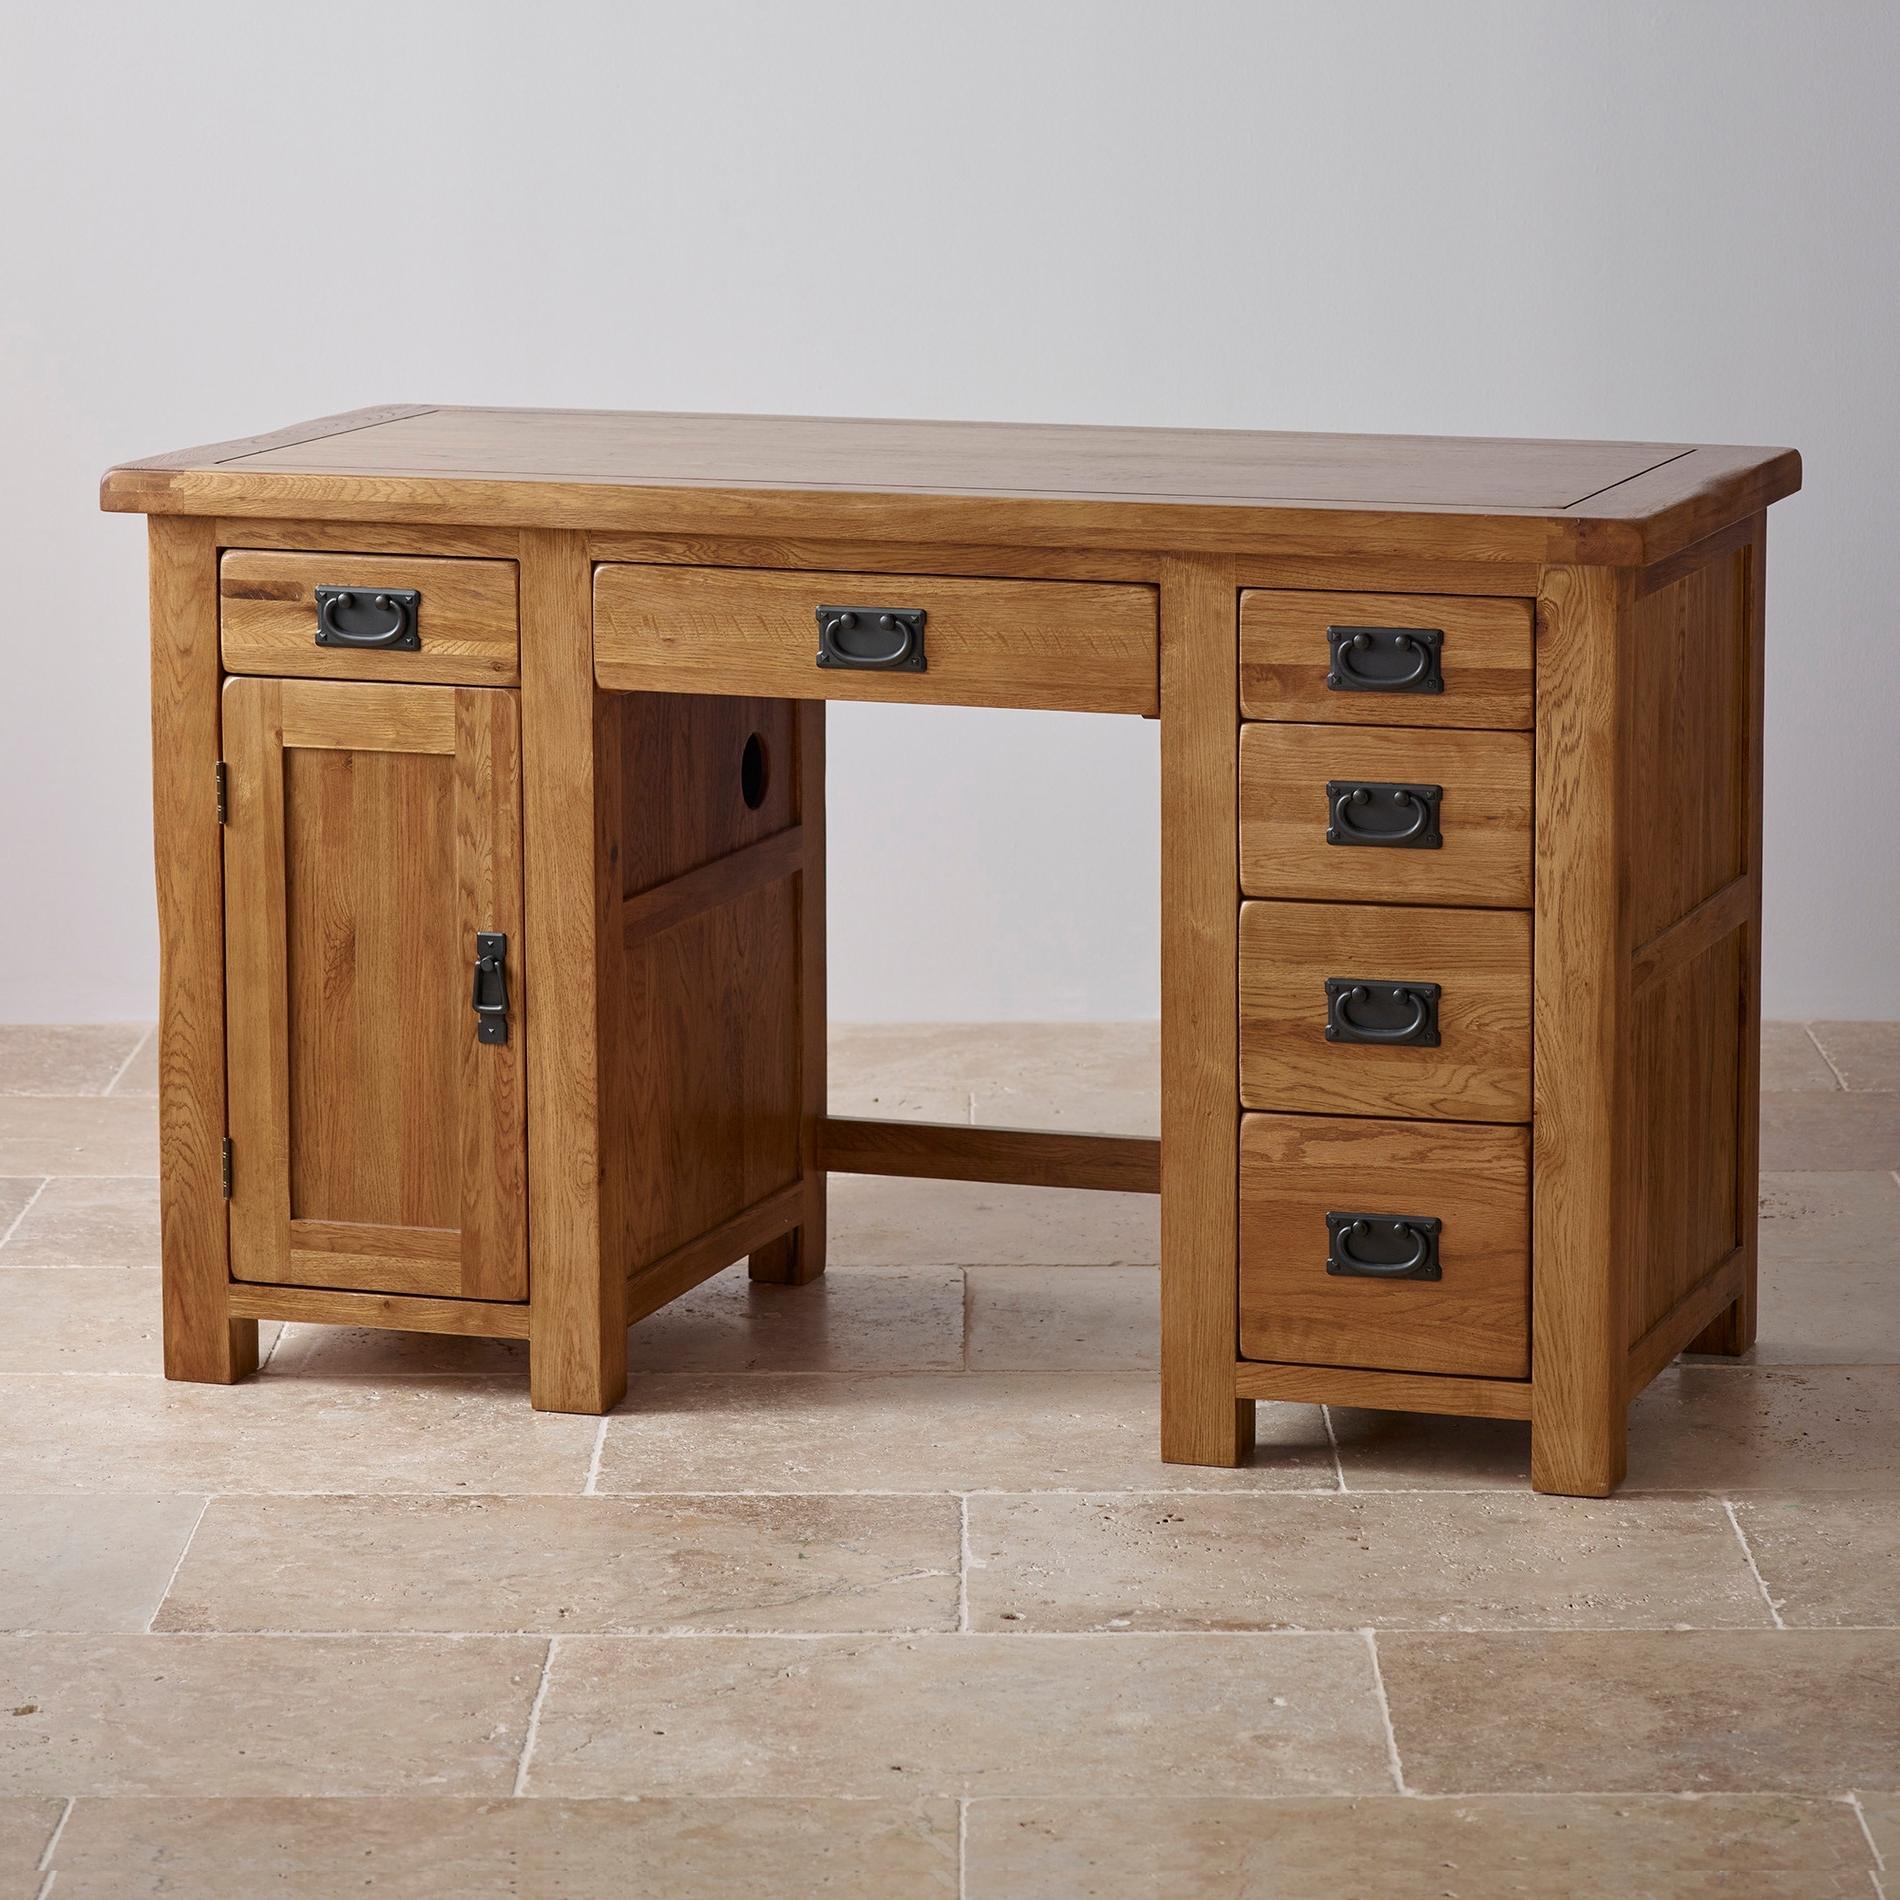 Favorite Computer Desks In Oak Intended For Original Rustic Computer Desk In Solid Oak (View 10 of 20)